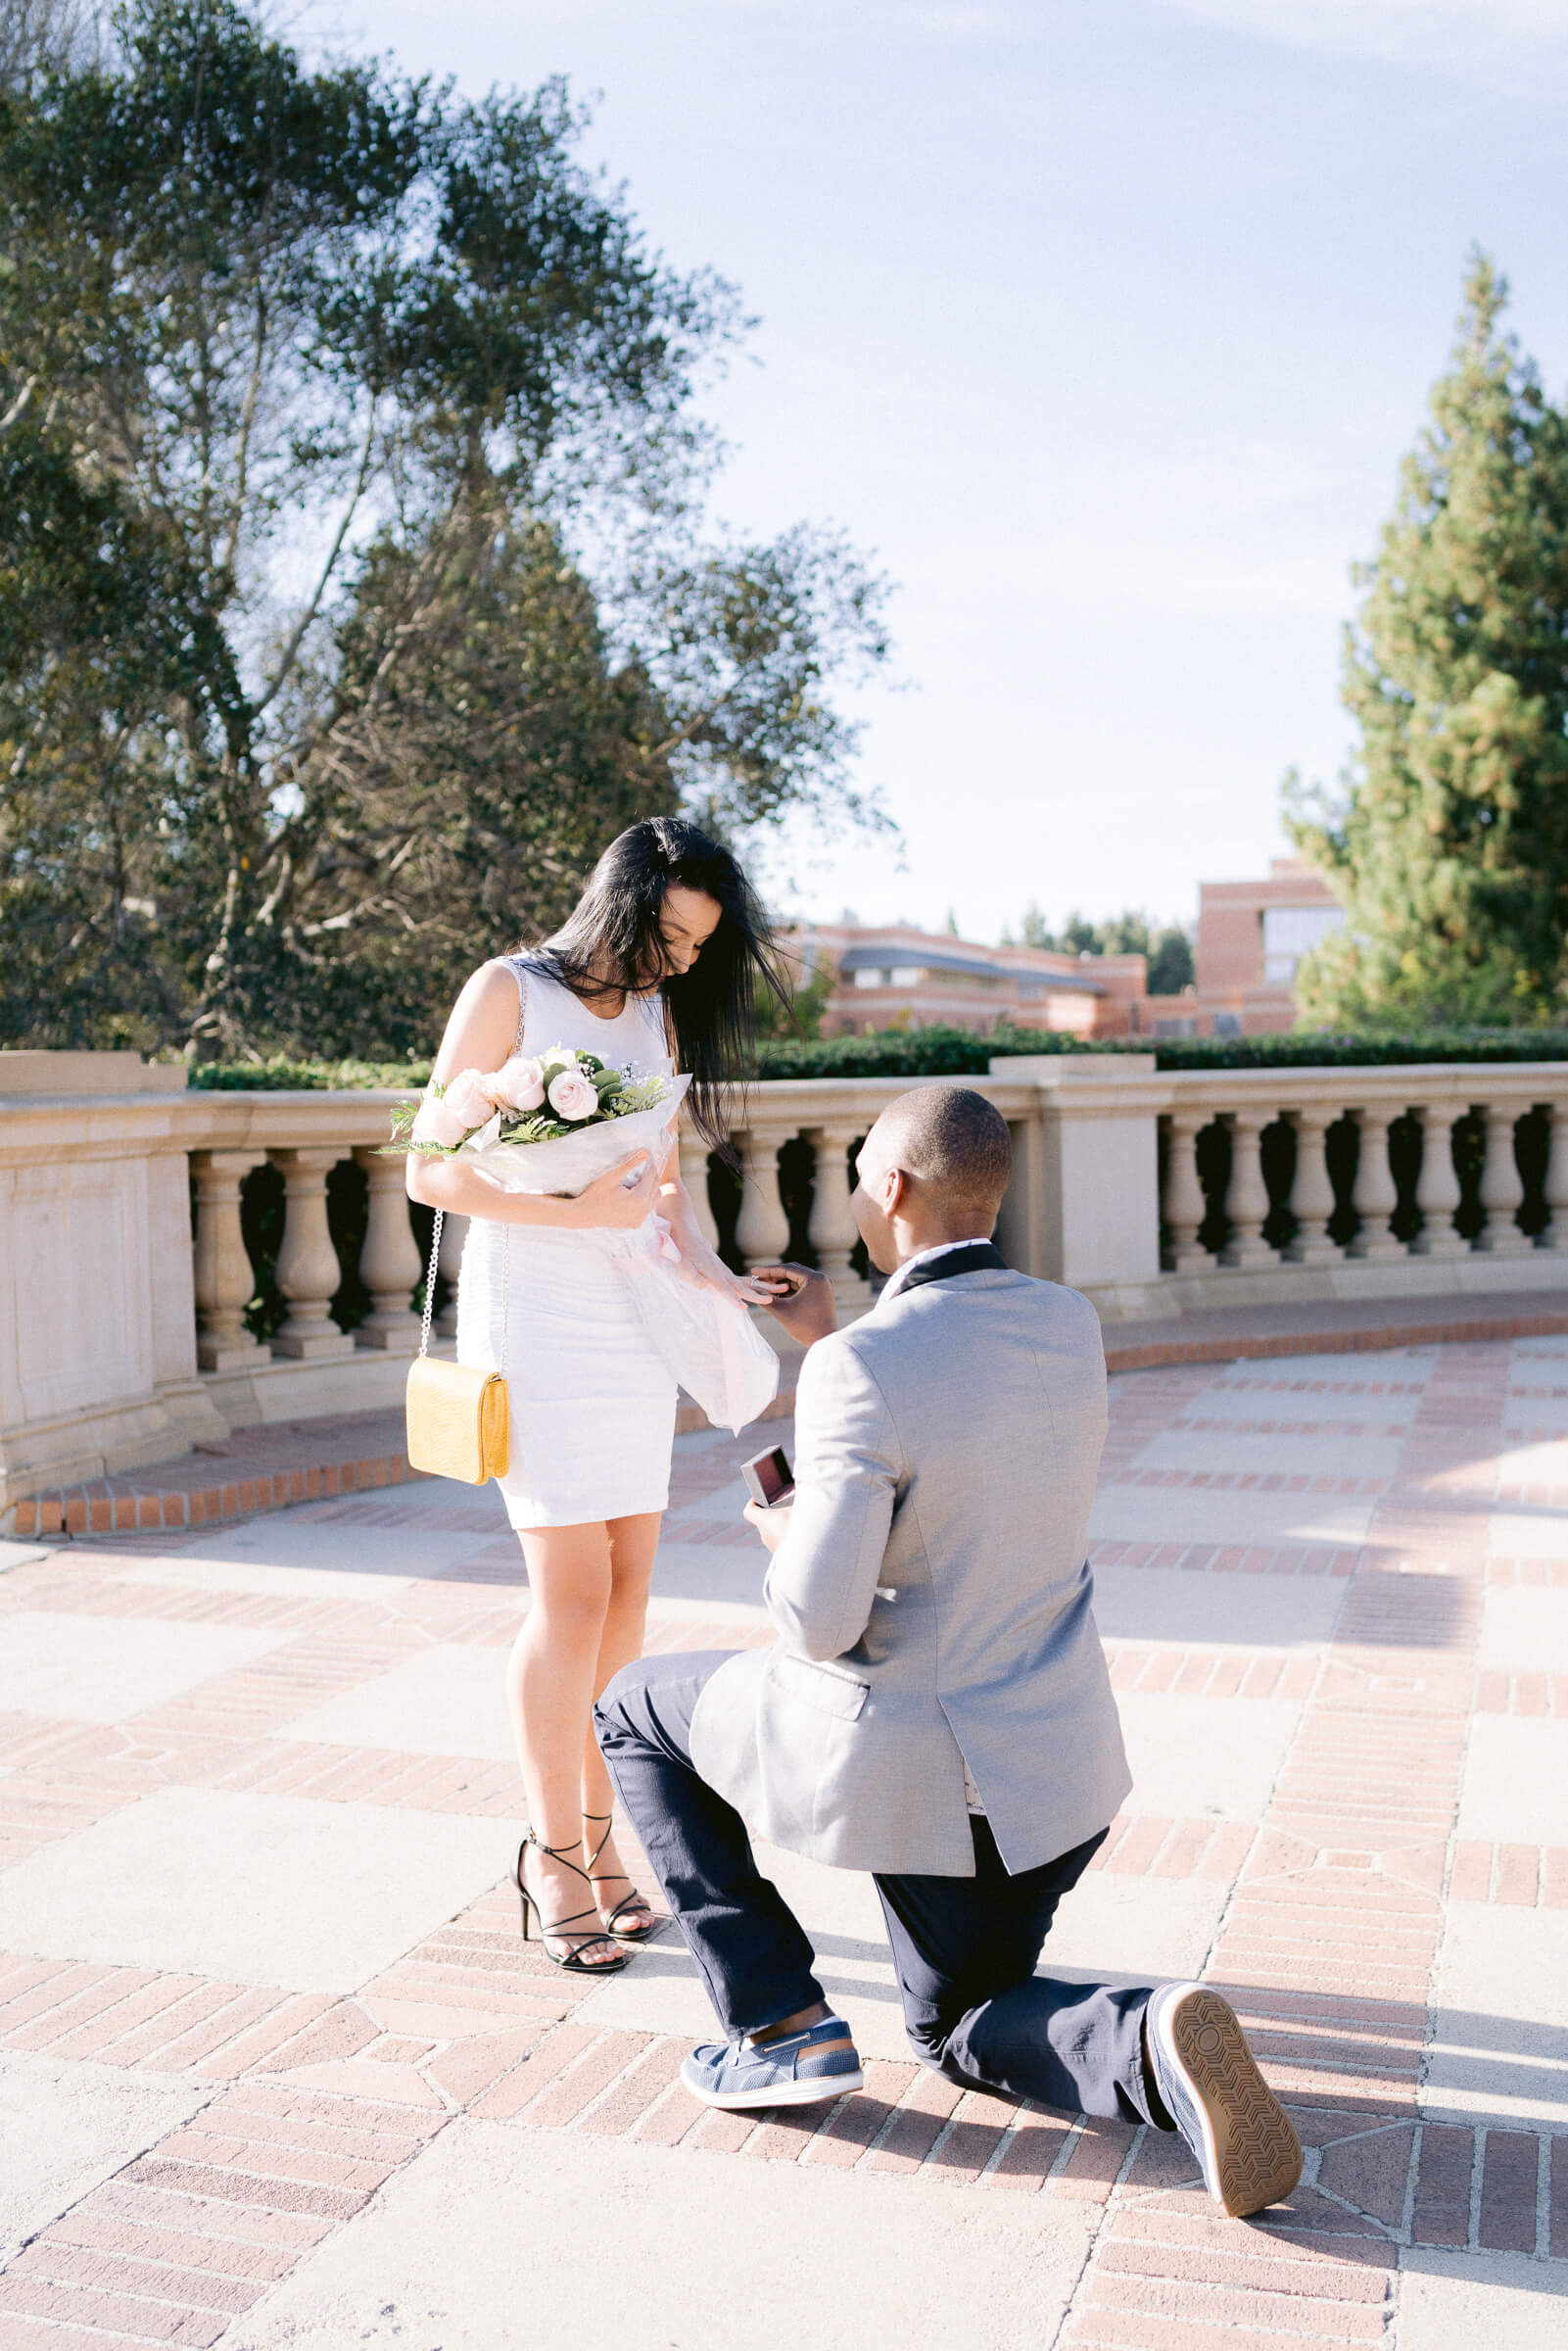 ucla-los-angeles-proposal-photographer-11.jpg